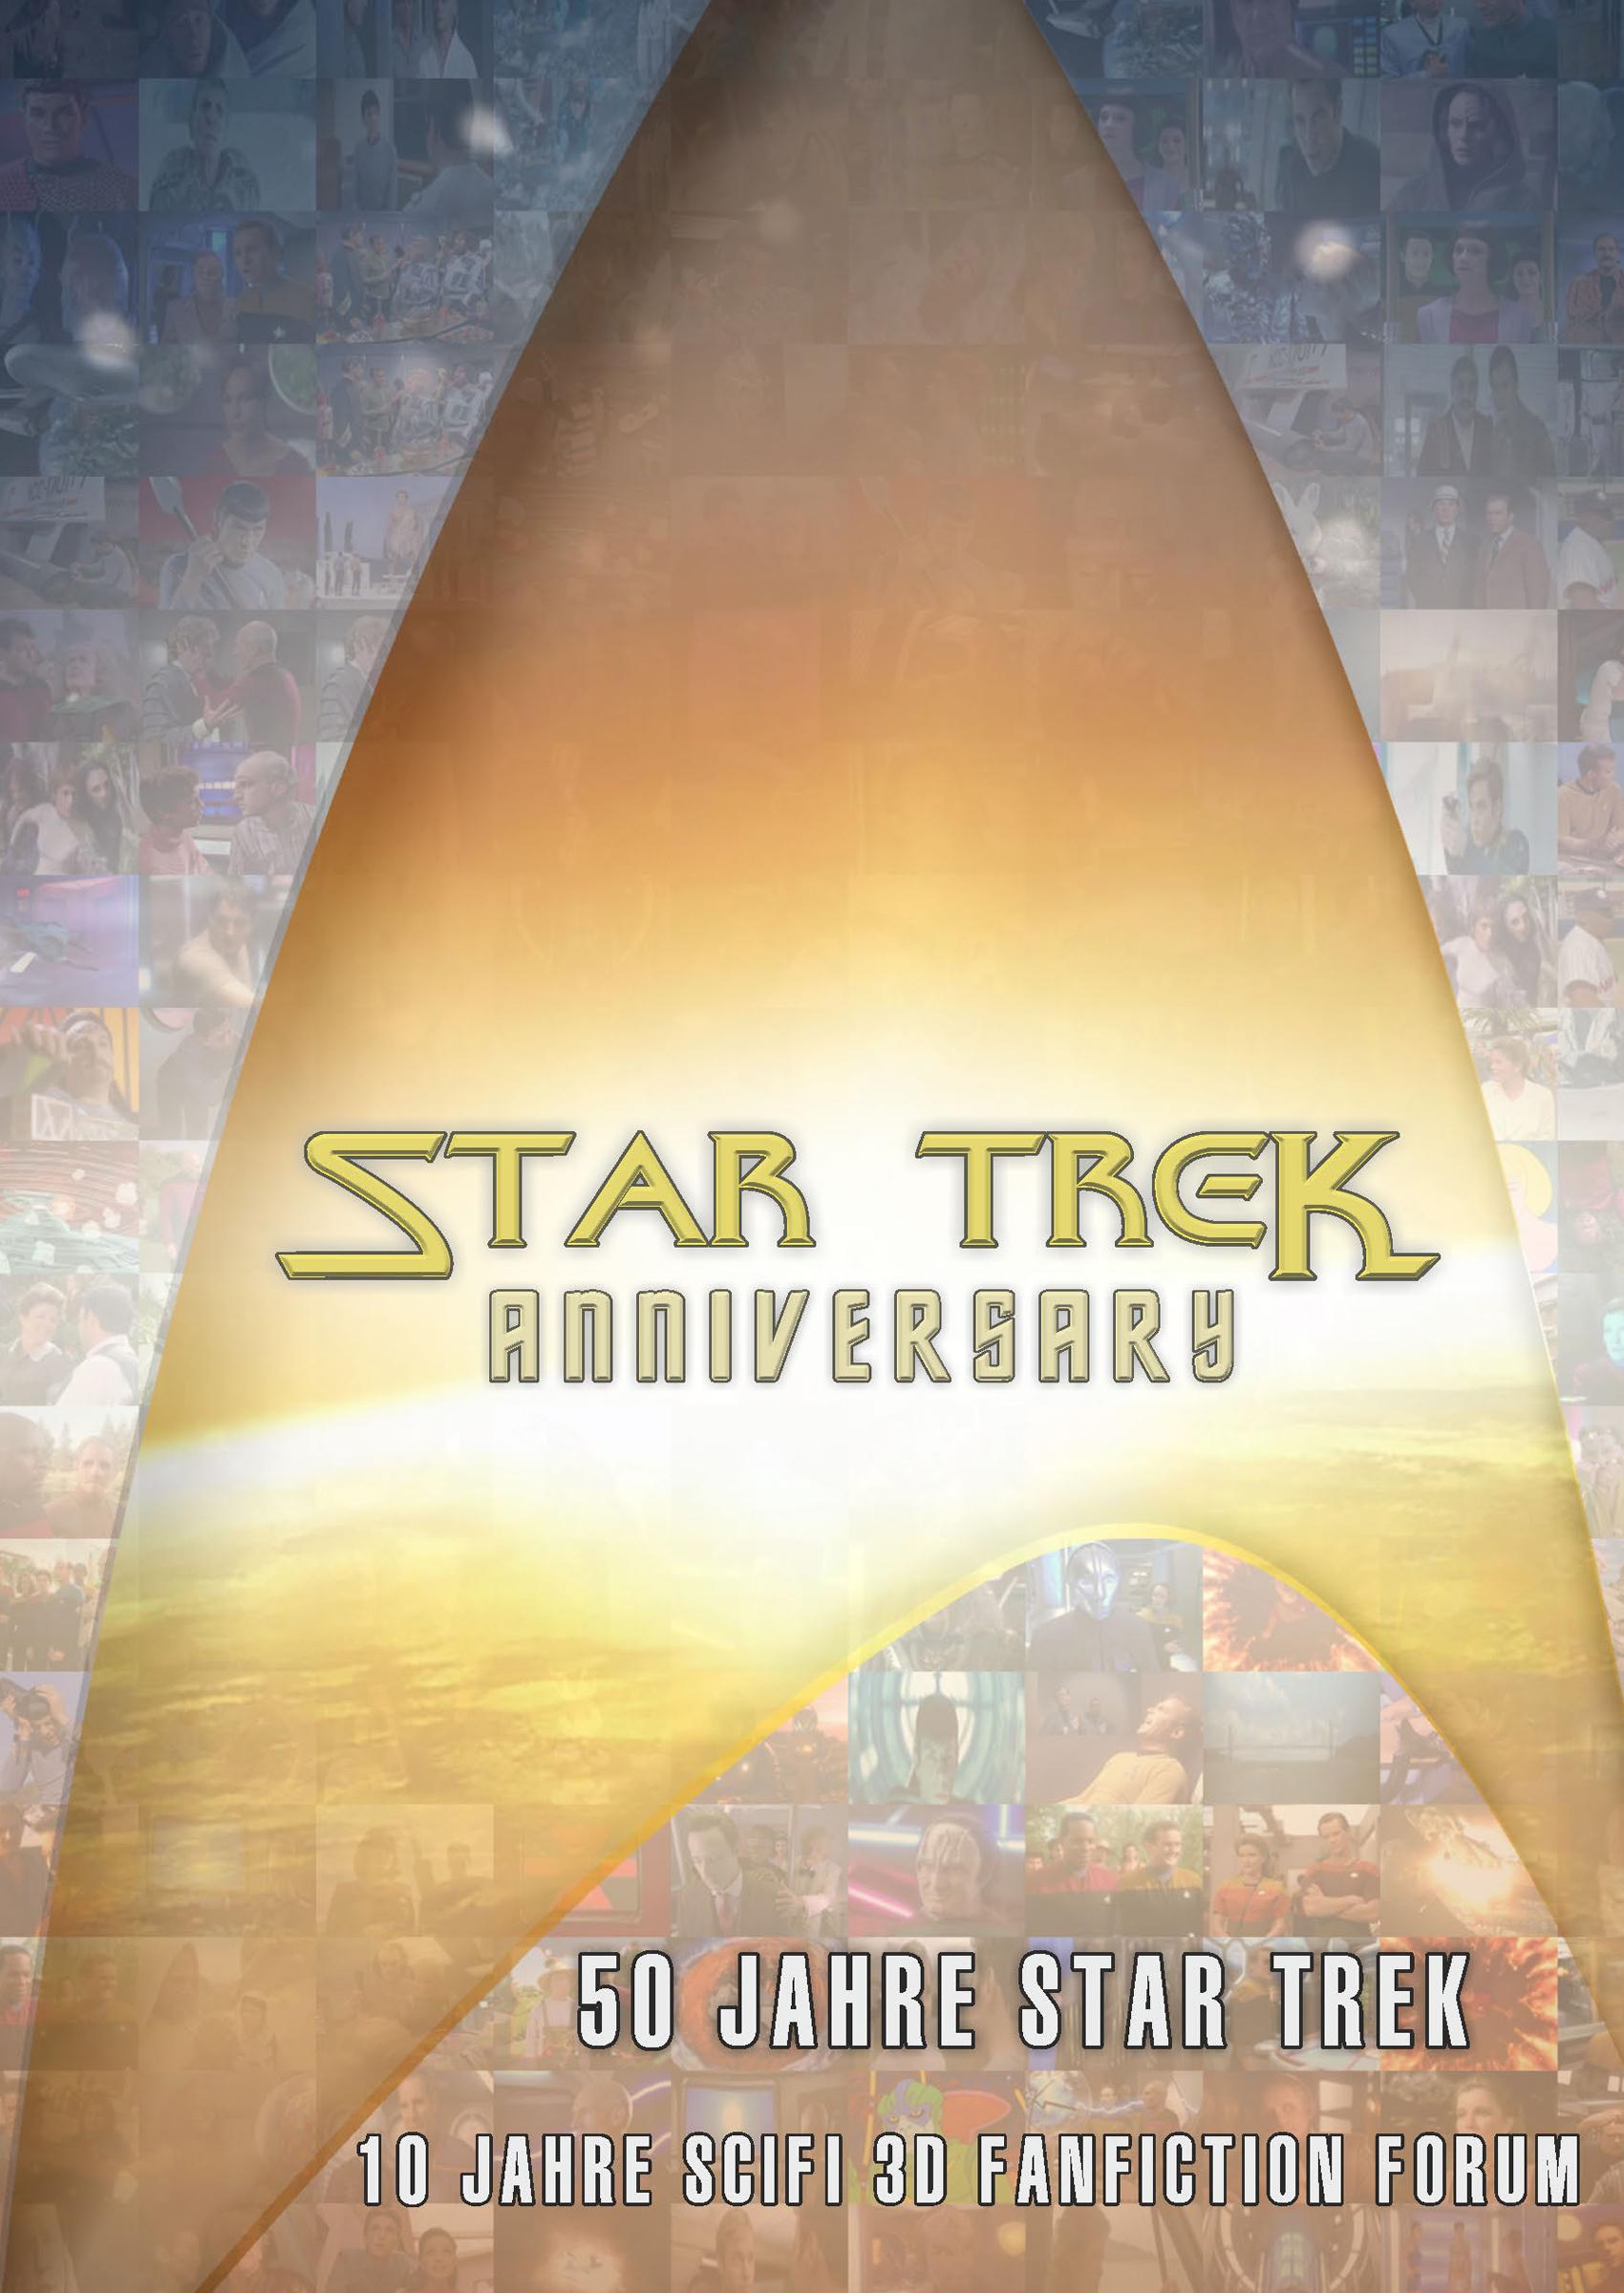 Star Trek 50th Anniversary FF-Anthology by SF3DFF by Joran-Belar